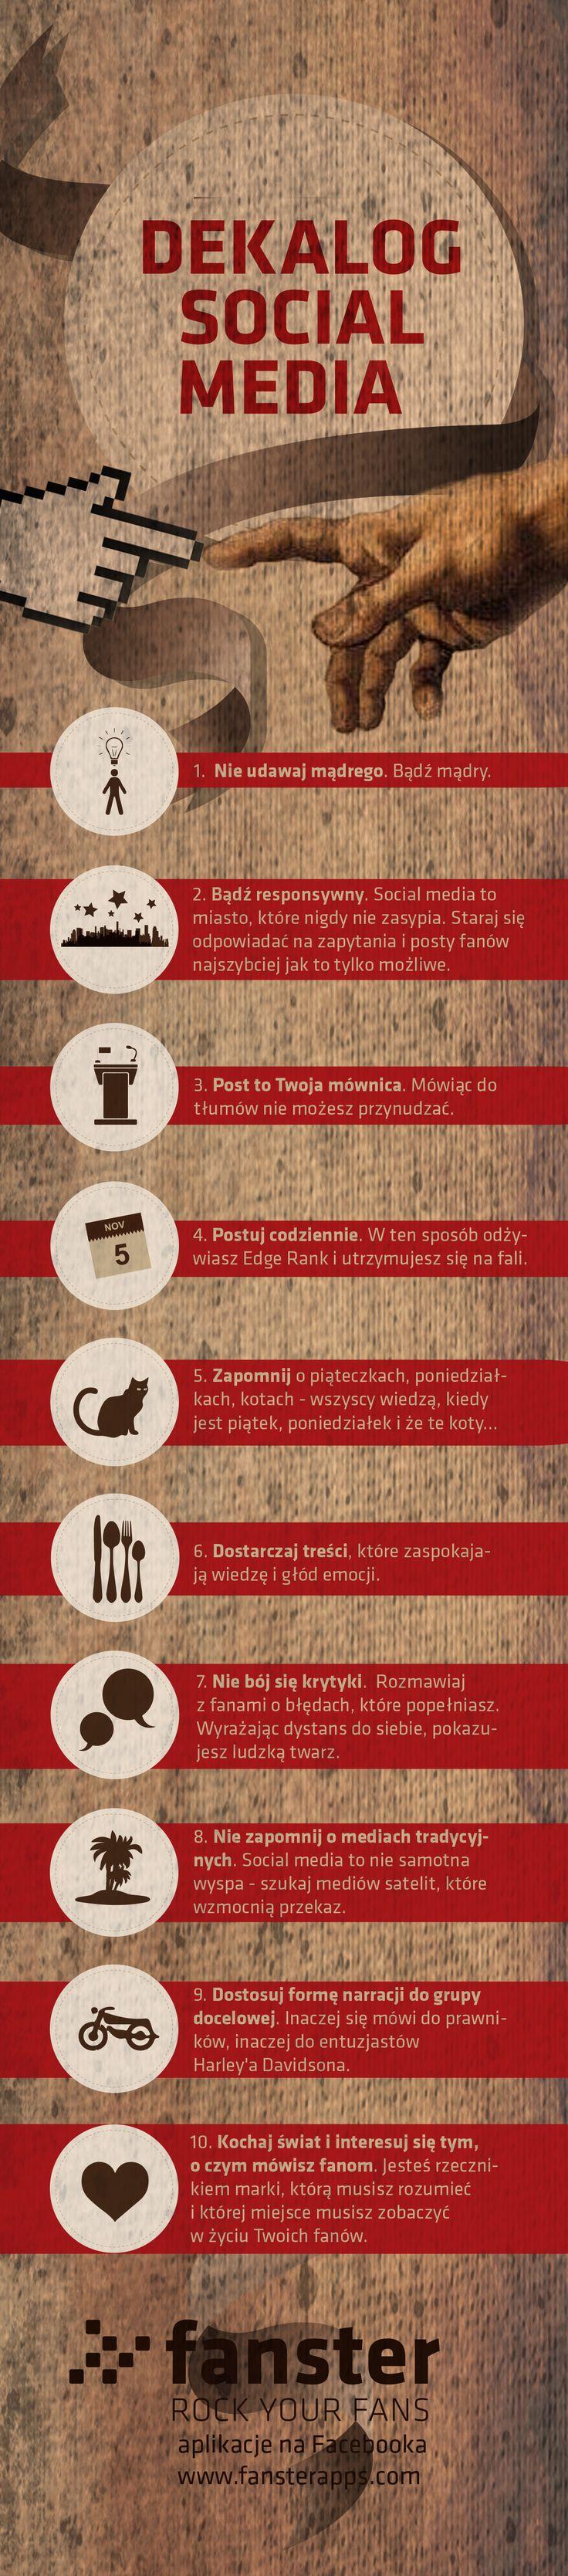 Dekalog social media. http://www.fanster.pl/blog/infografika-dekalog-social-media/ #infografika #socialmedia